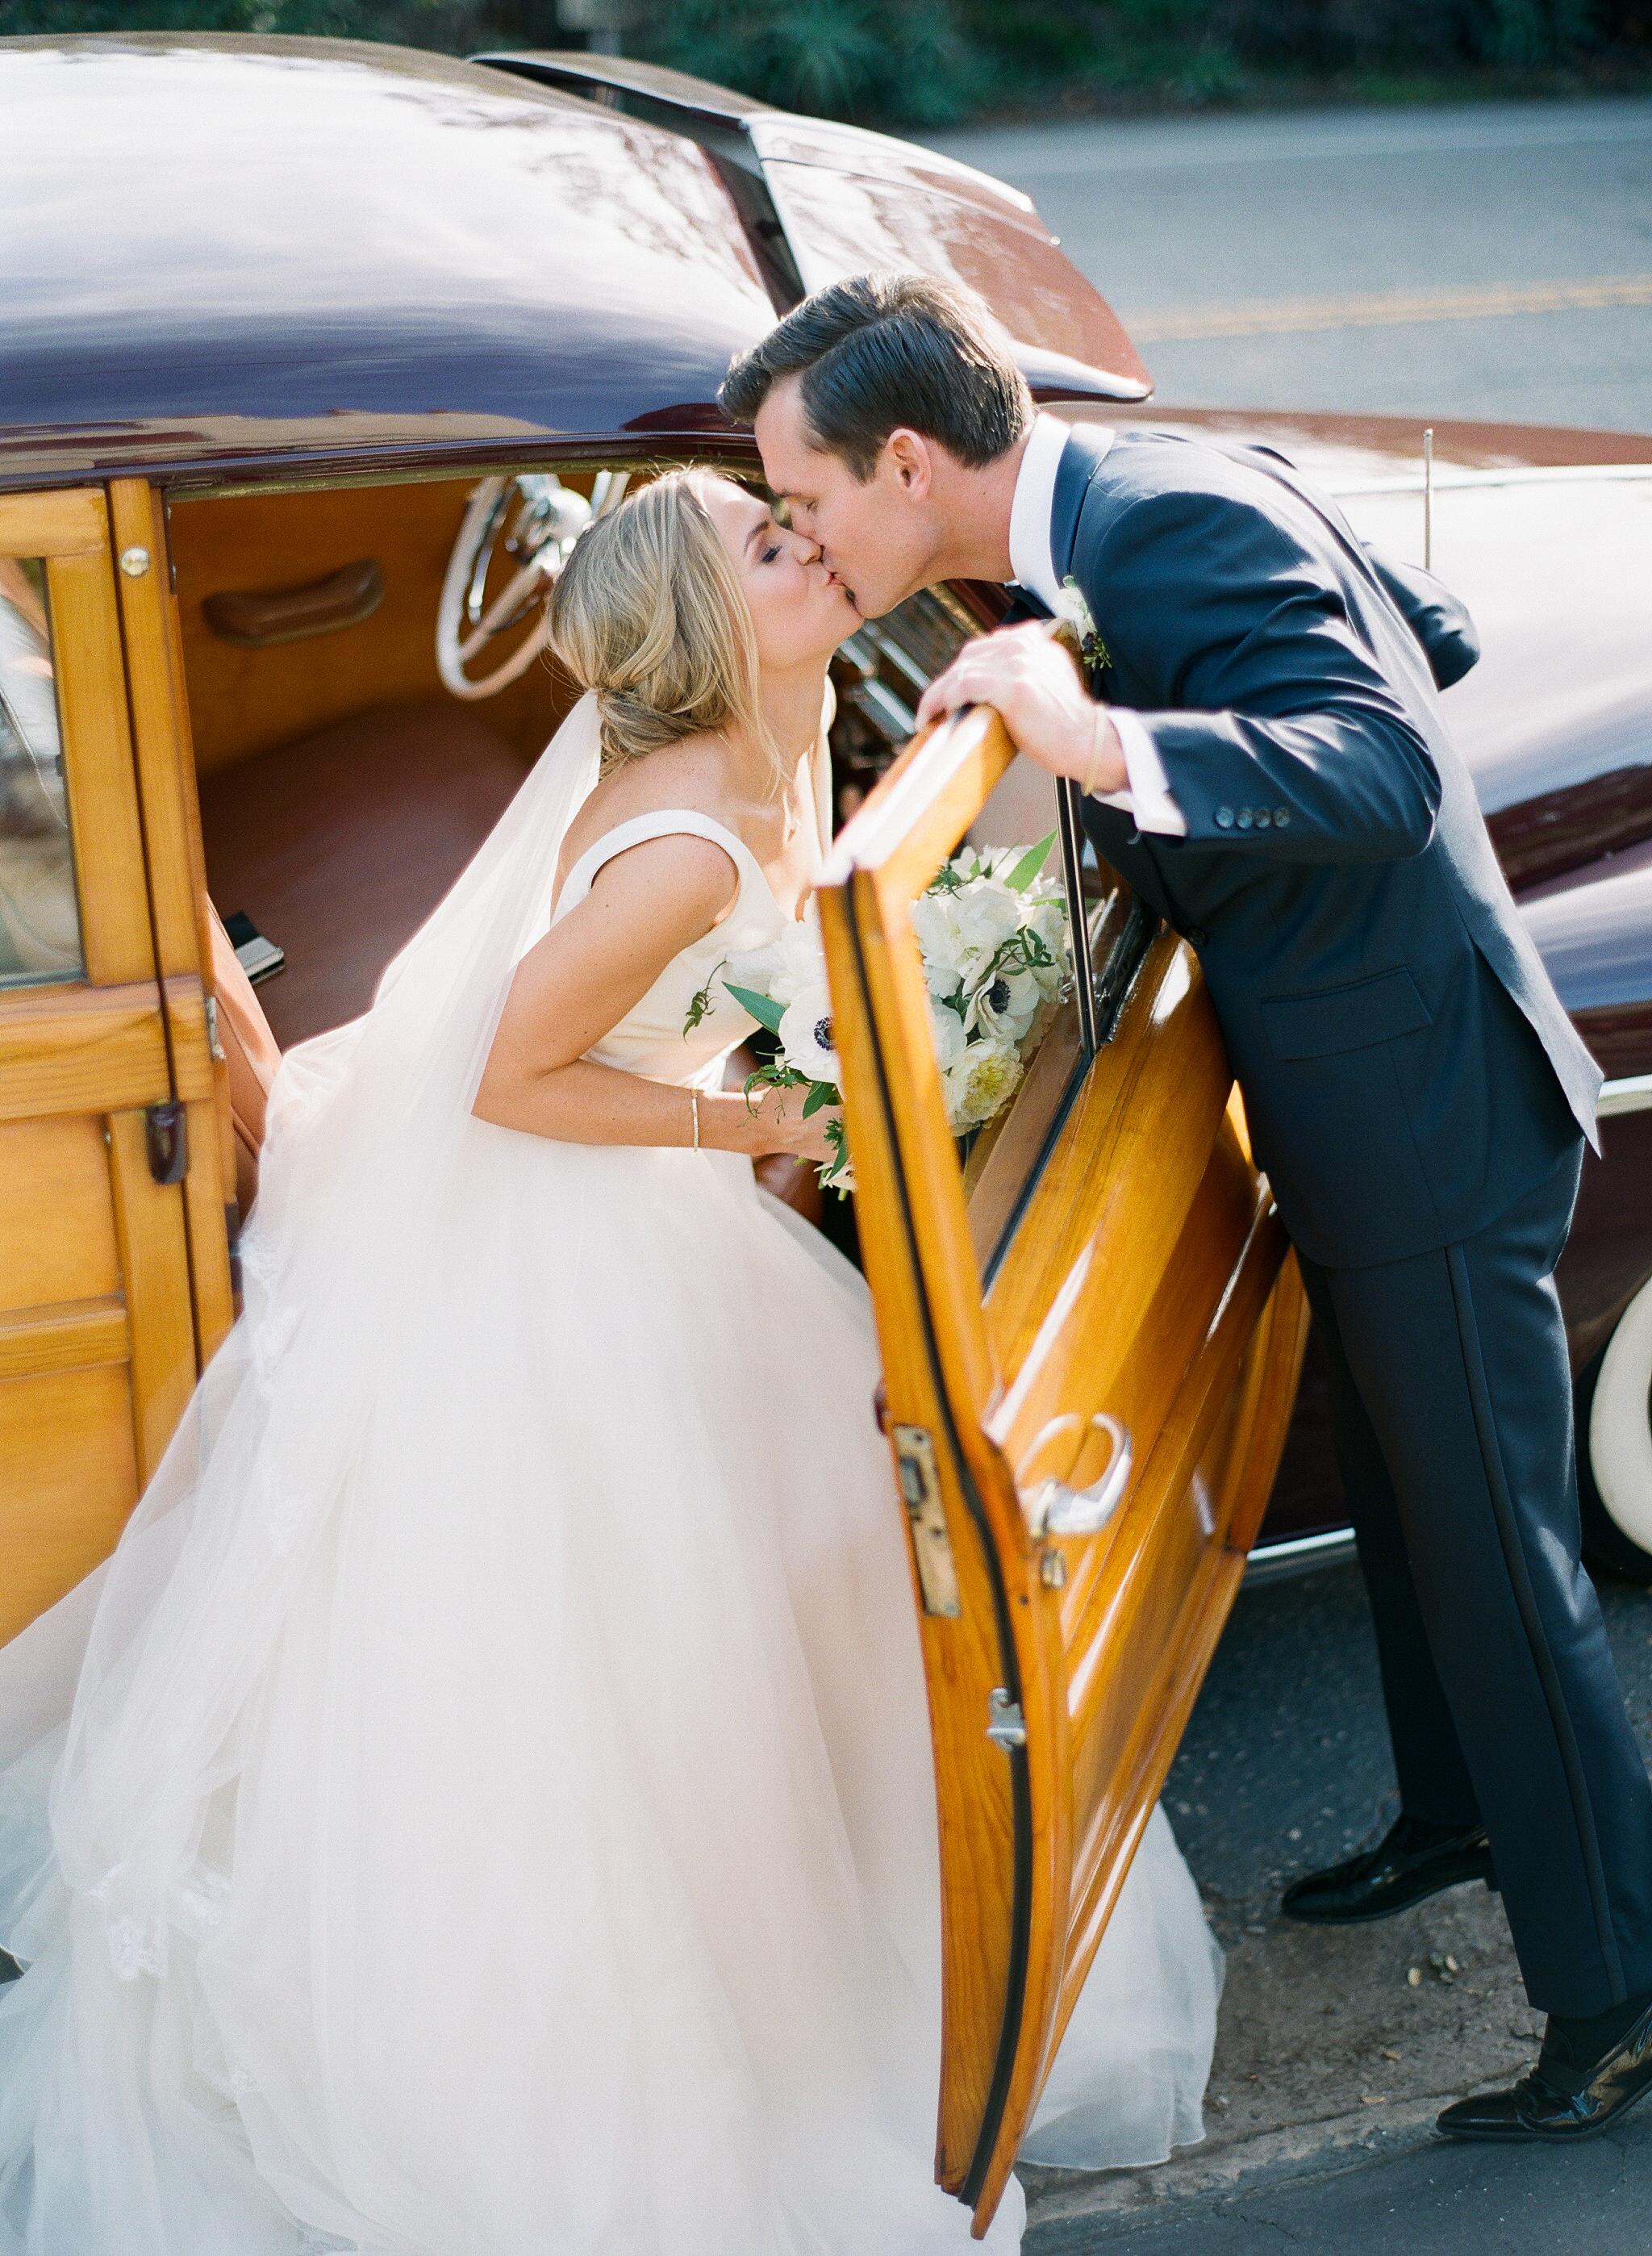 cloudless-weddings-videographer-musts-1016.jpg (skyword:350134)